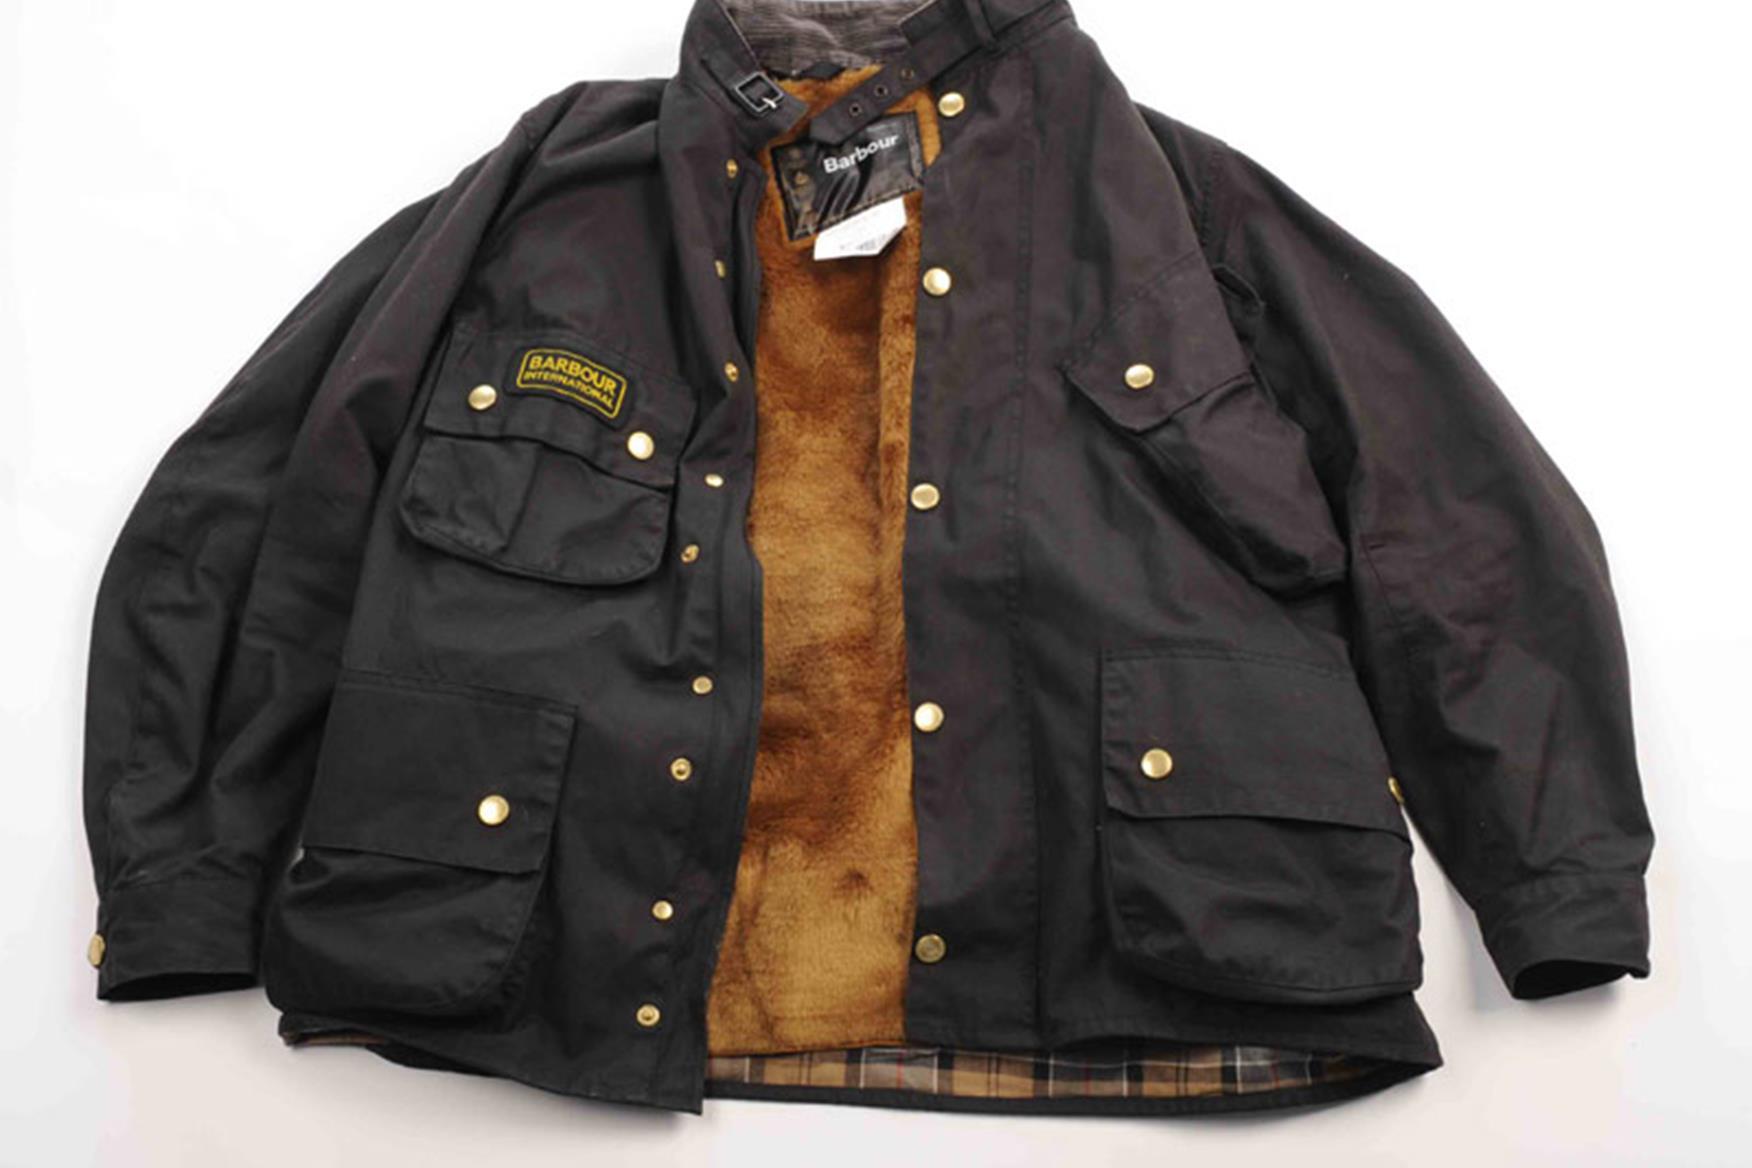 bb1f9d4d97 Review Barbour International Mcn Trials Kit Jacket wAq8xC8Y